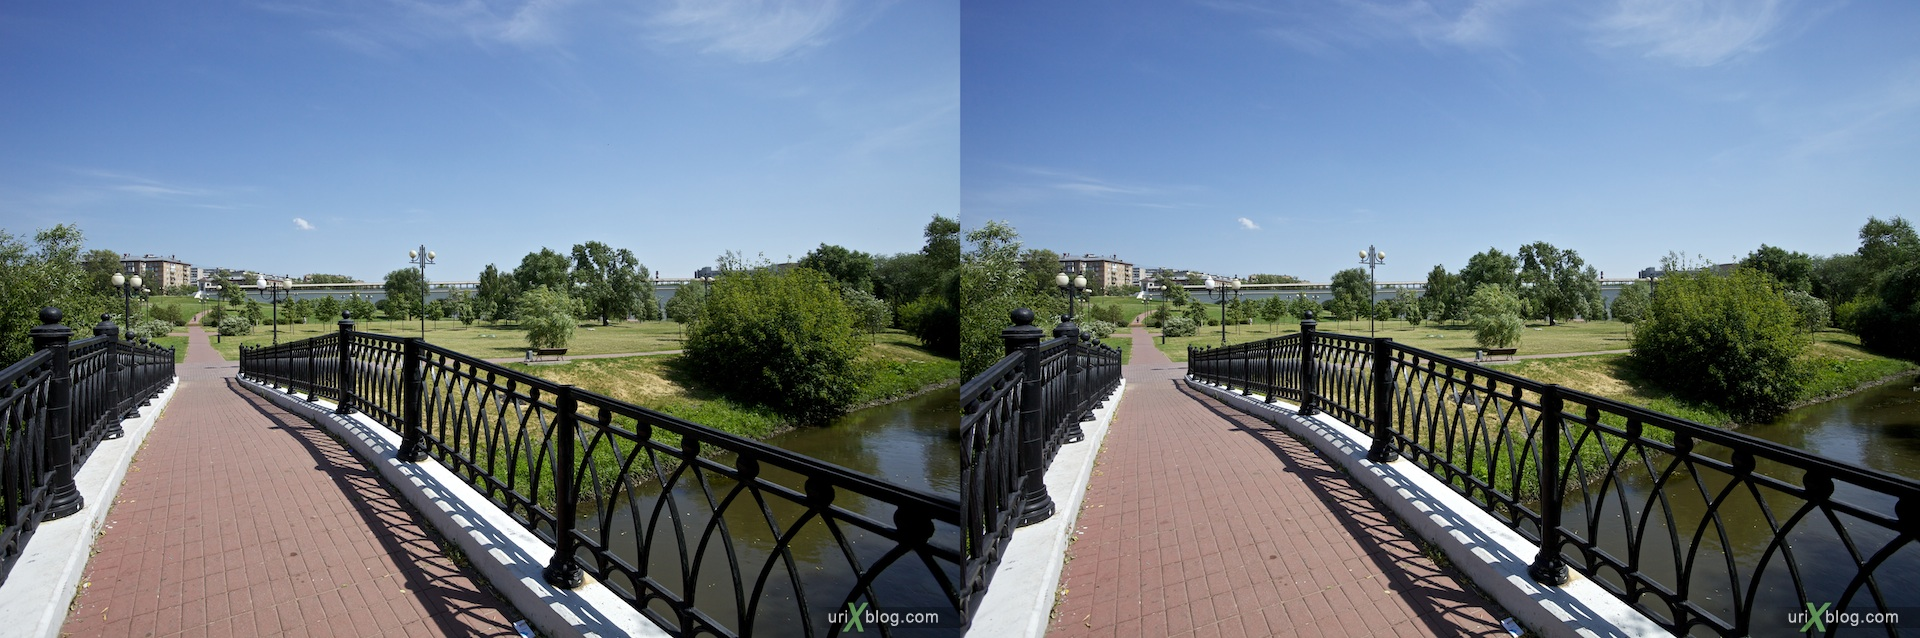 2010 3D, stereo, cross-eyed, стерео, стереопара Moscow, Rostokino Aqueduct, Москва Ростокинский акведук